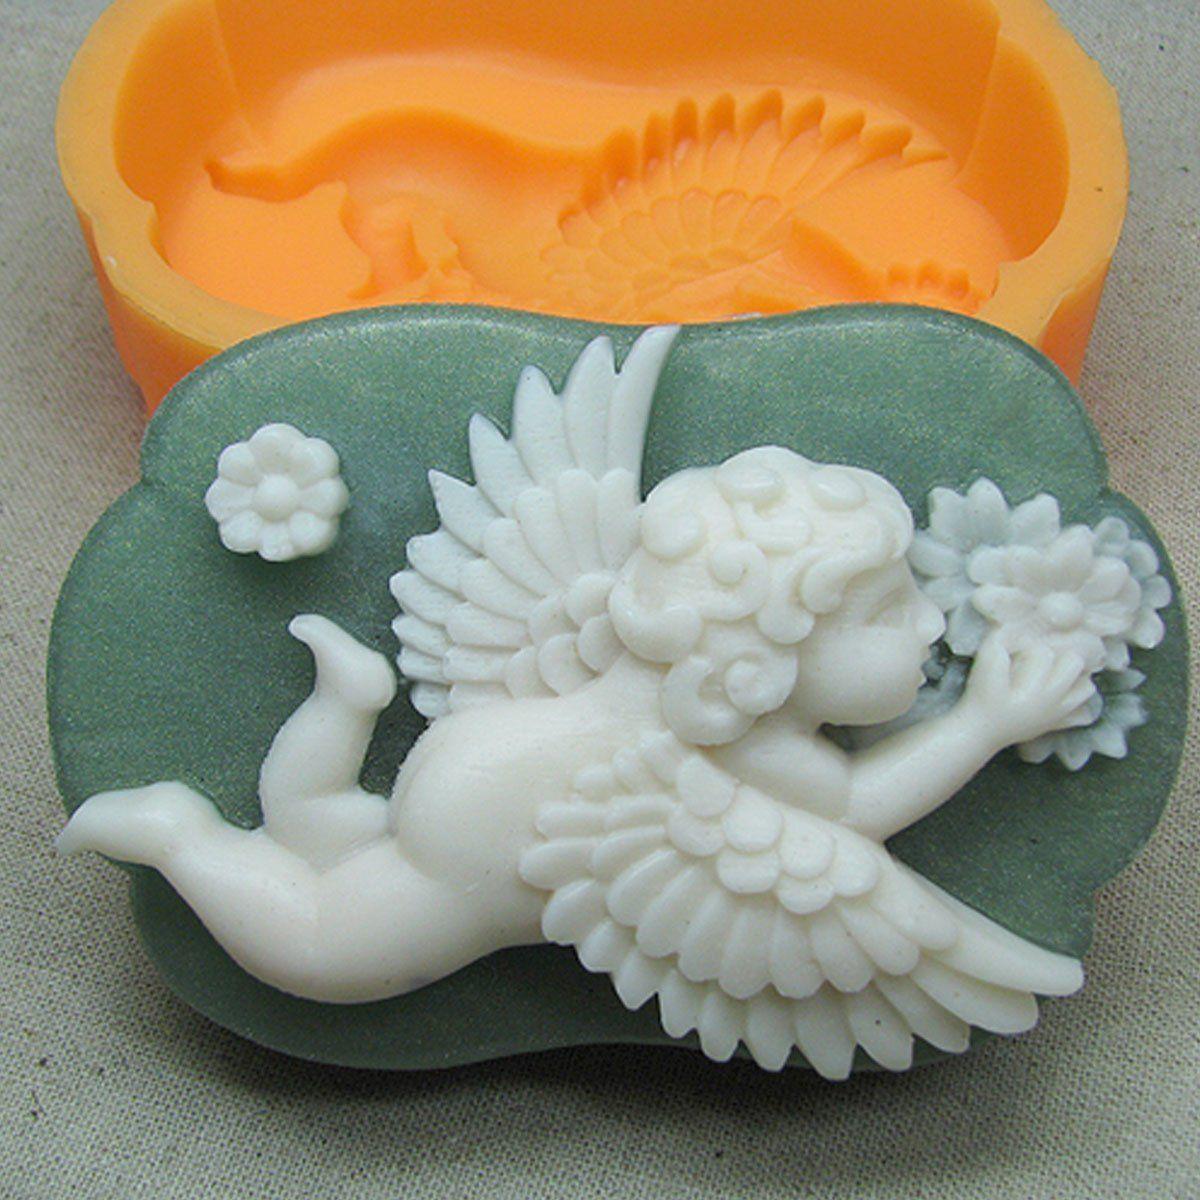 Chawoorim craft silicone molds resin handmade soap making baby angel